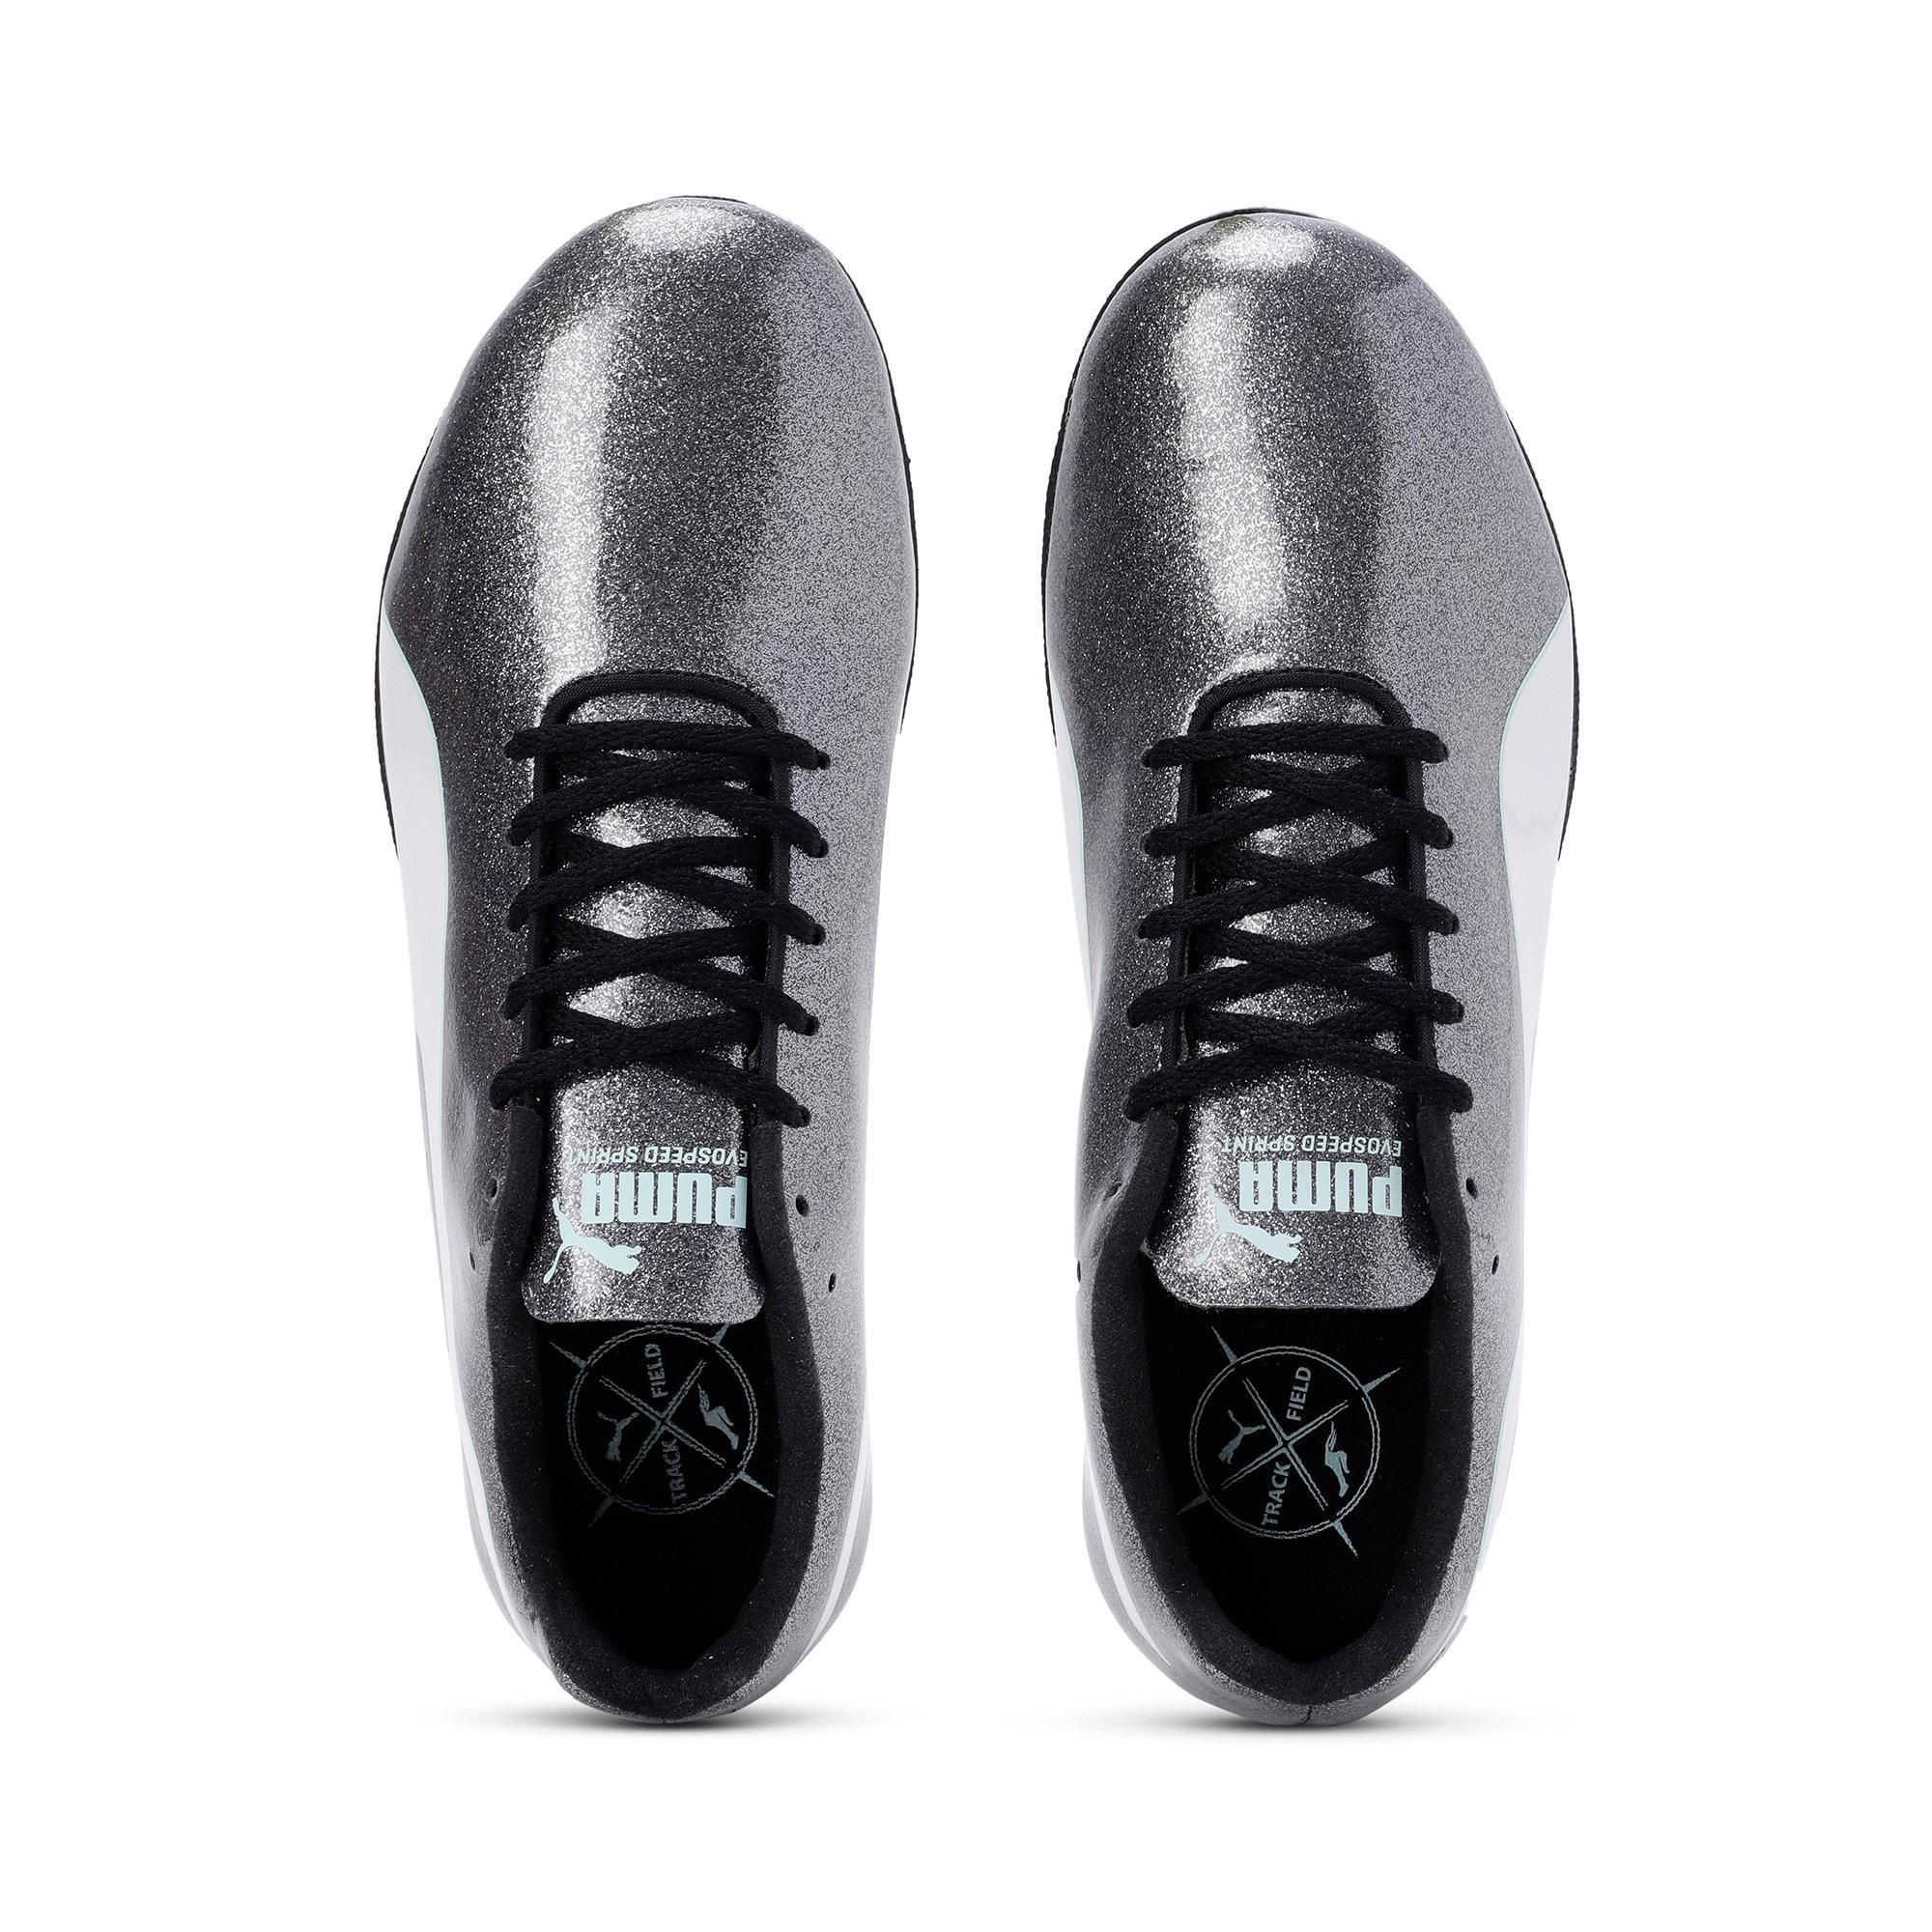 Thumbnail 6 of evoSPEED Sprint 9 Women's Running Shoes, Steel Gray-Fair Aqua-White, medium-IND